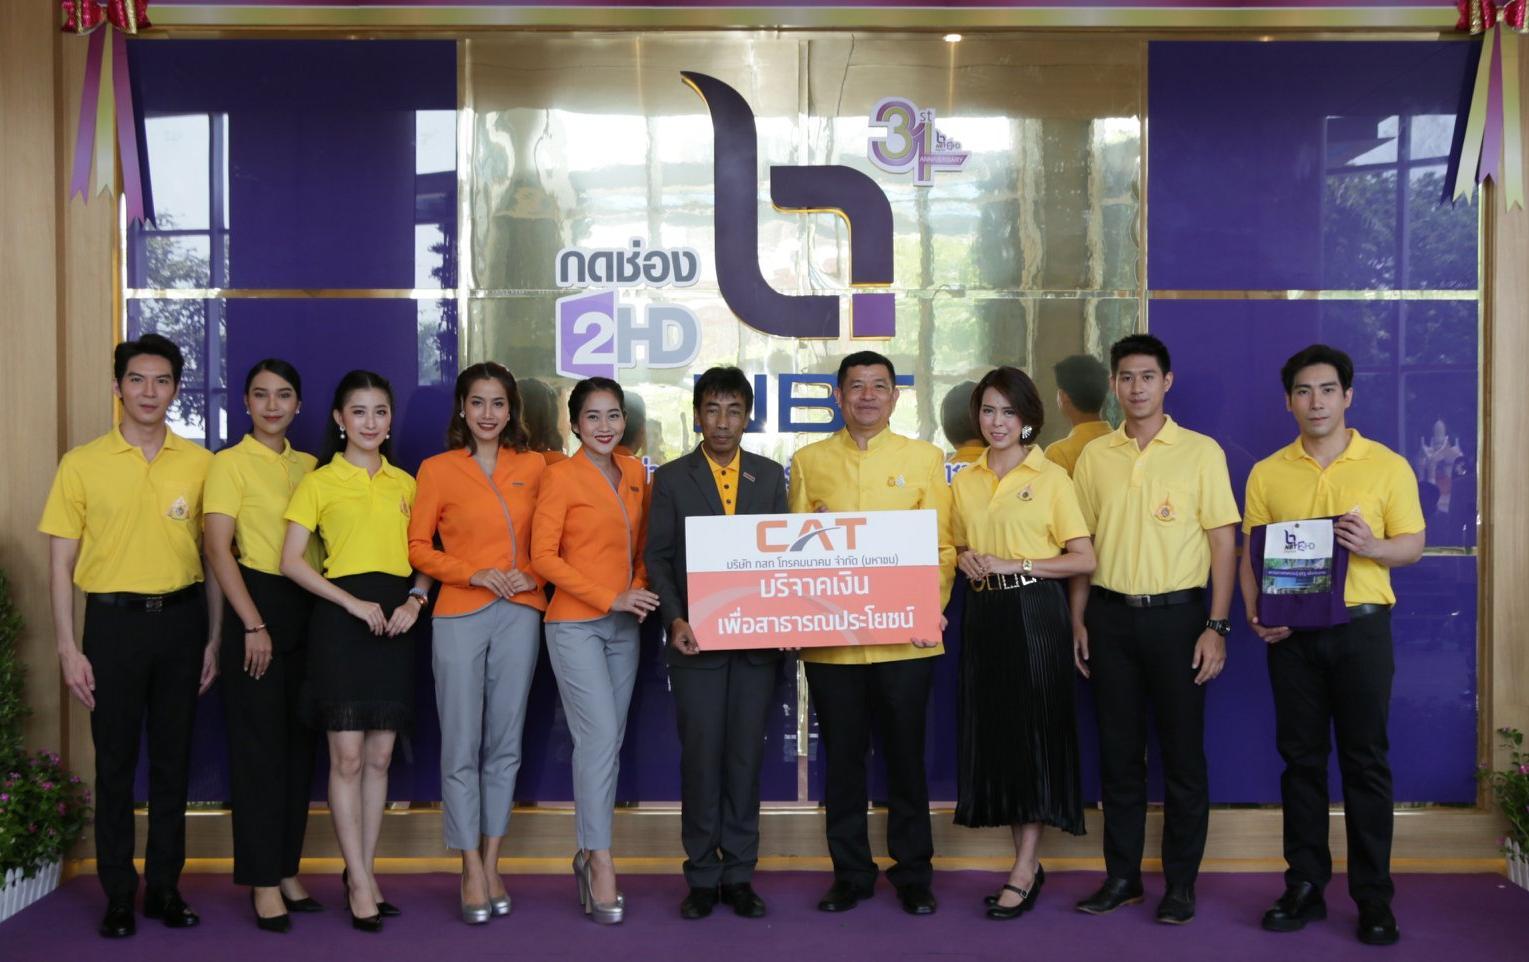 CAT ร่วมแสดงความยินดี สถานีวิทยุโทรทัศน์แห่งประเทศไทย ครบรอบ 31 ปี